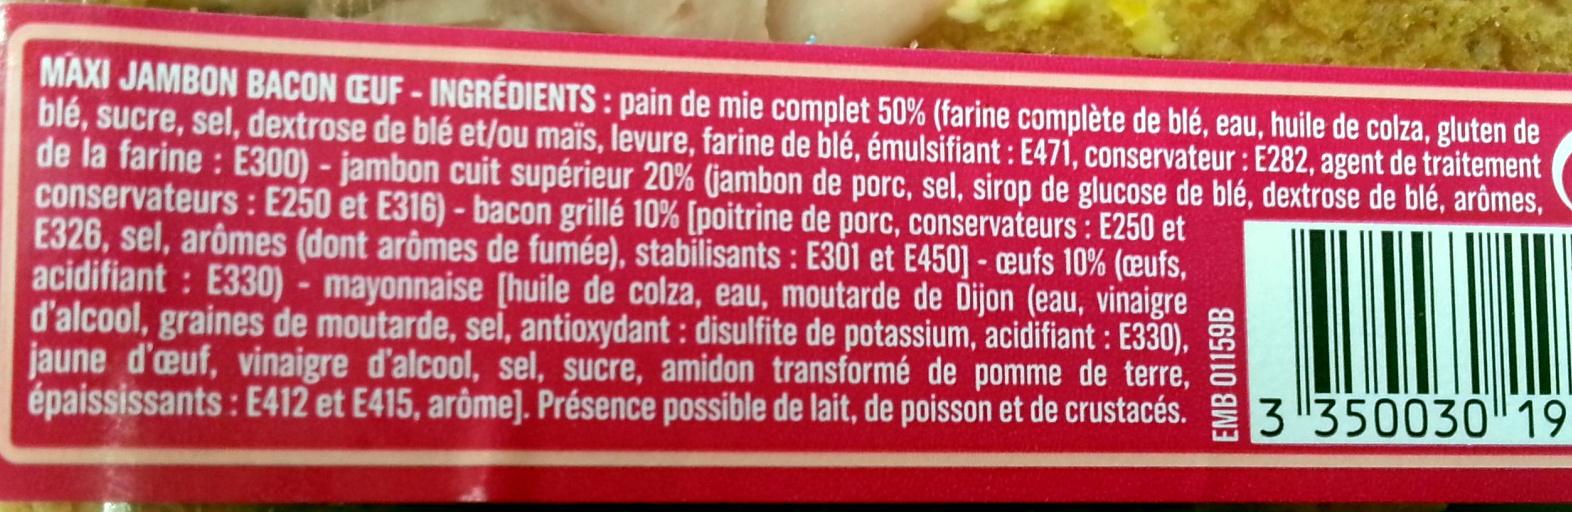 Maxi Jambon Bacon Oeuf - Ingrédients - fr